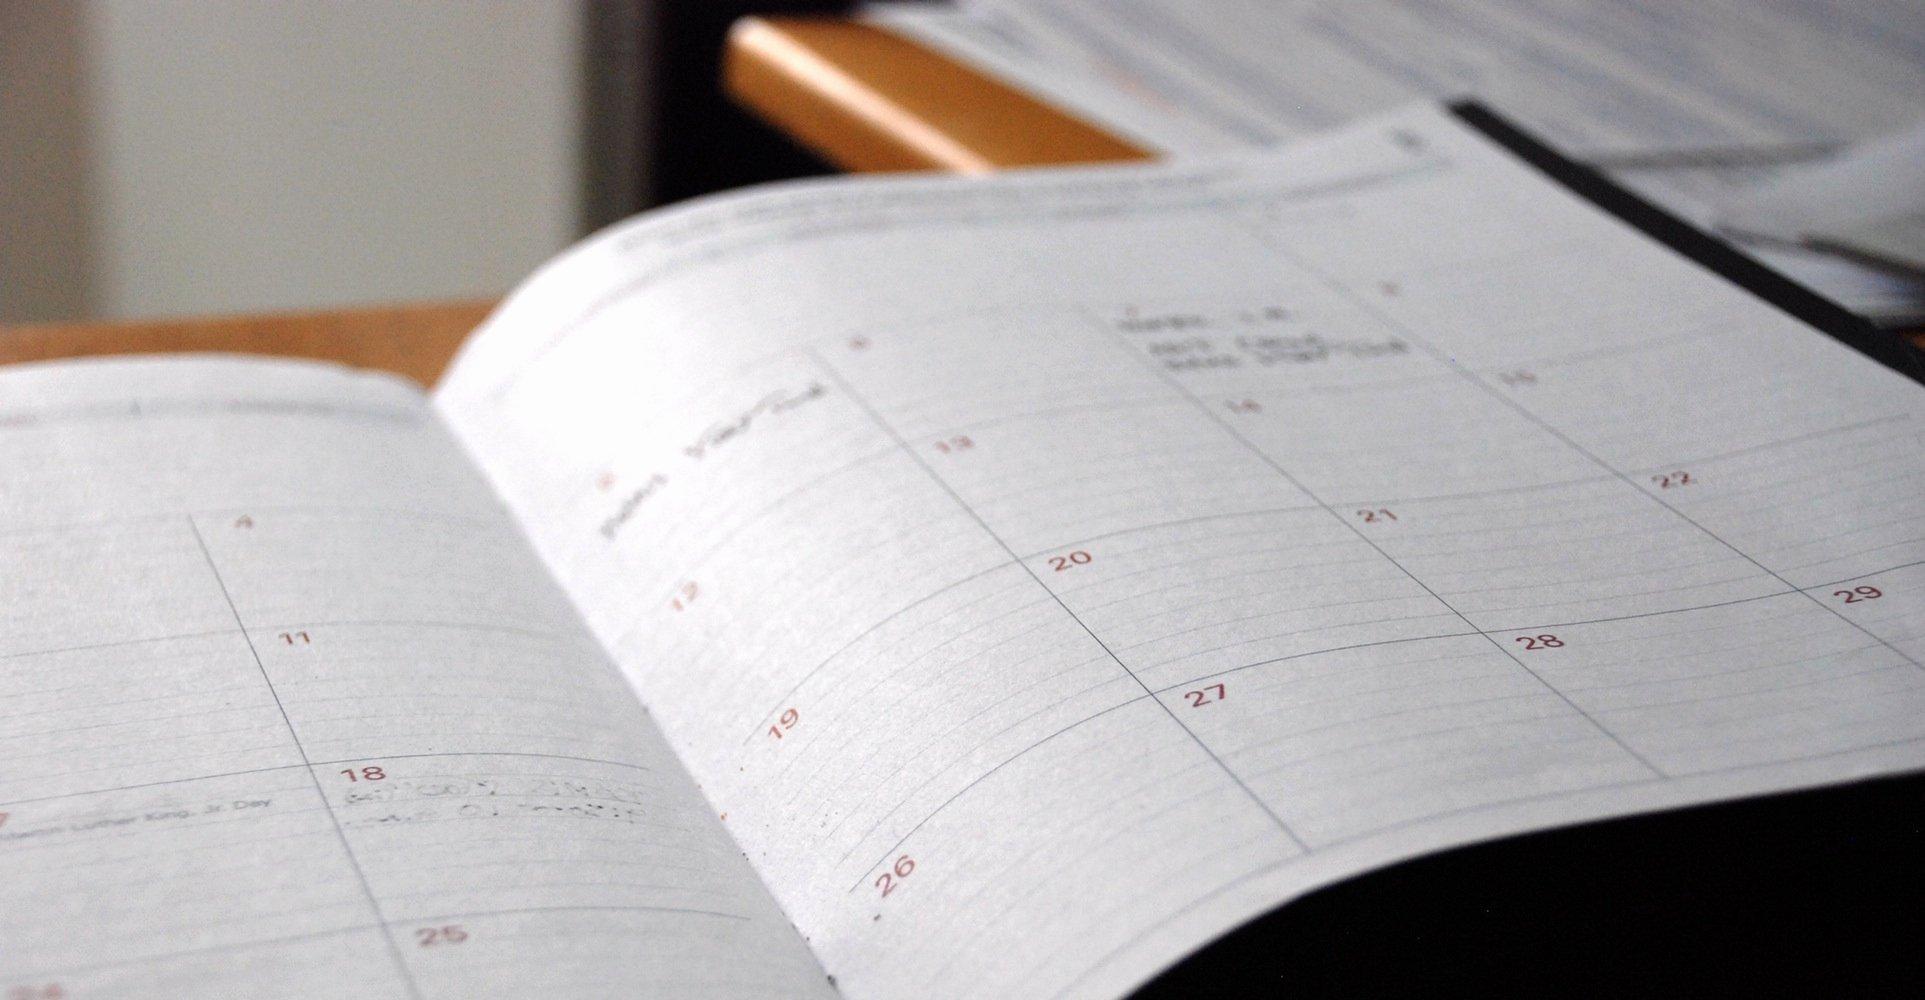 Nonprofit Board Meeting Agenda Template Fresh Board Meeting Agenda format and Template